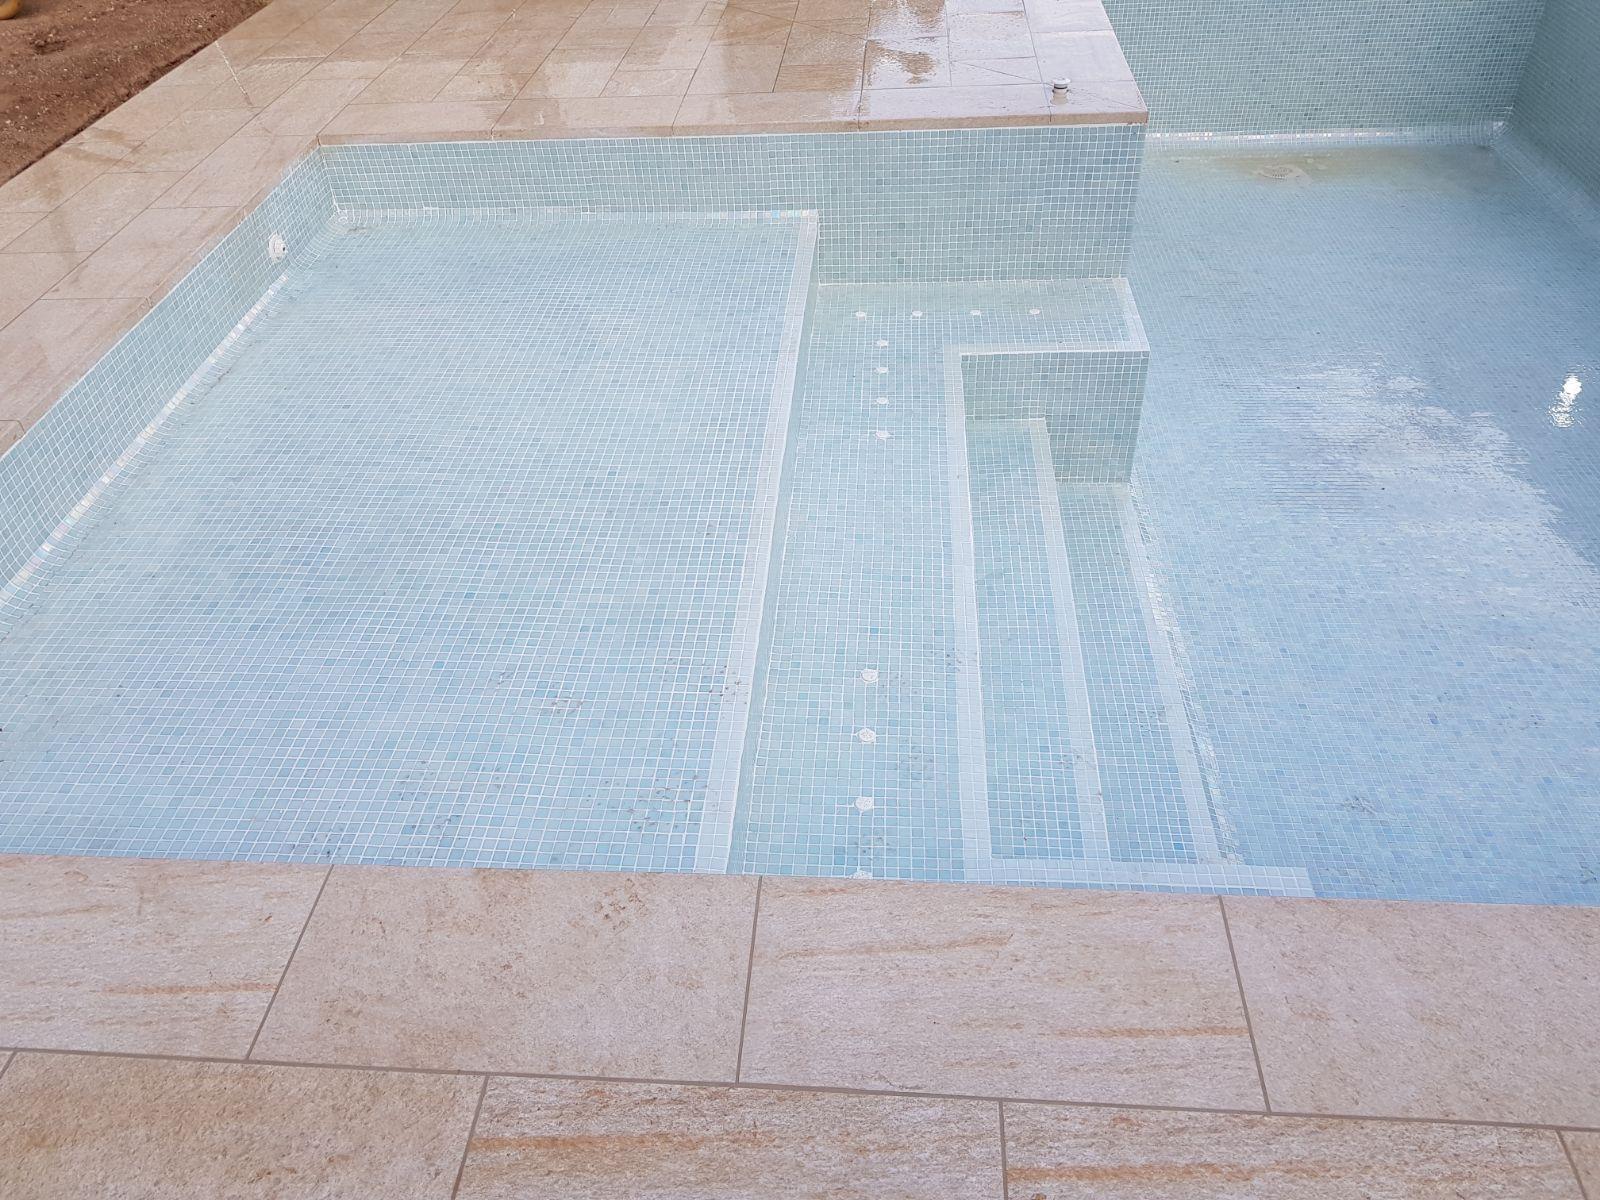 reforma_piscina_1_17